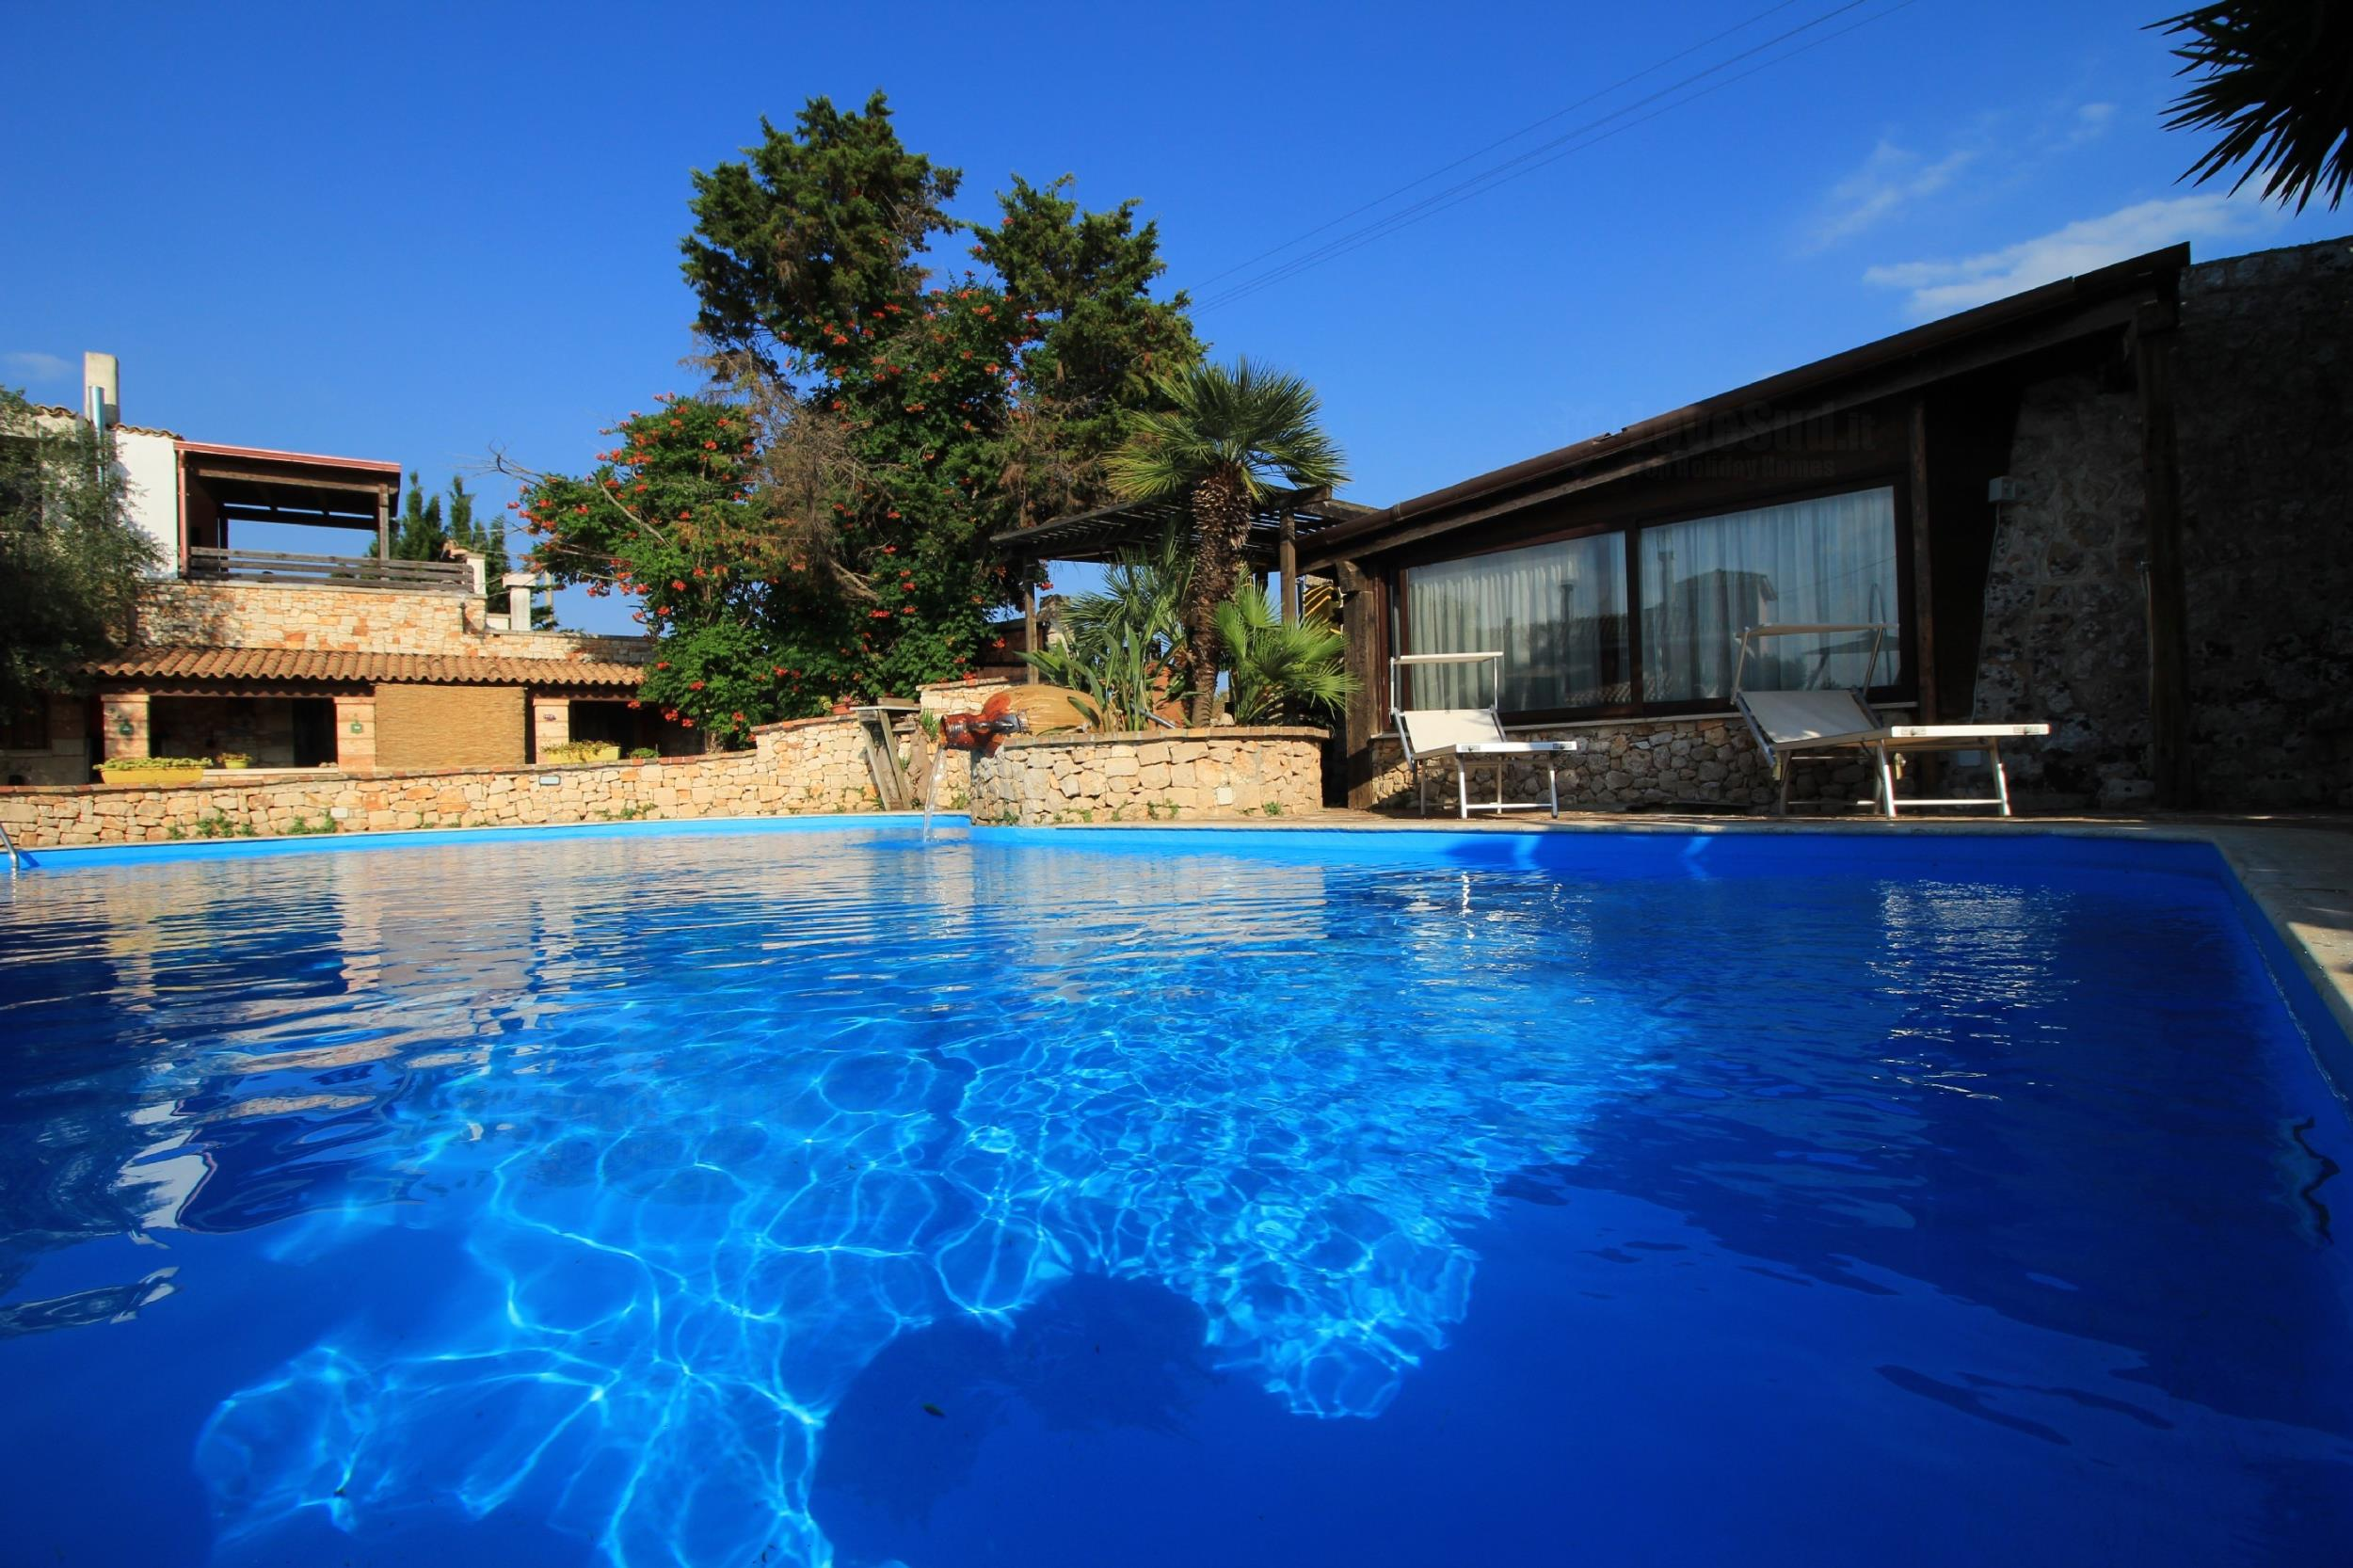 Apartment Taverna piscina e WI FI photo 22471920